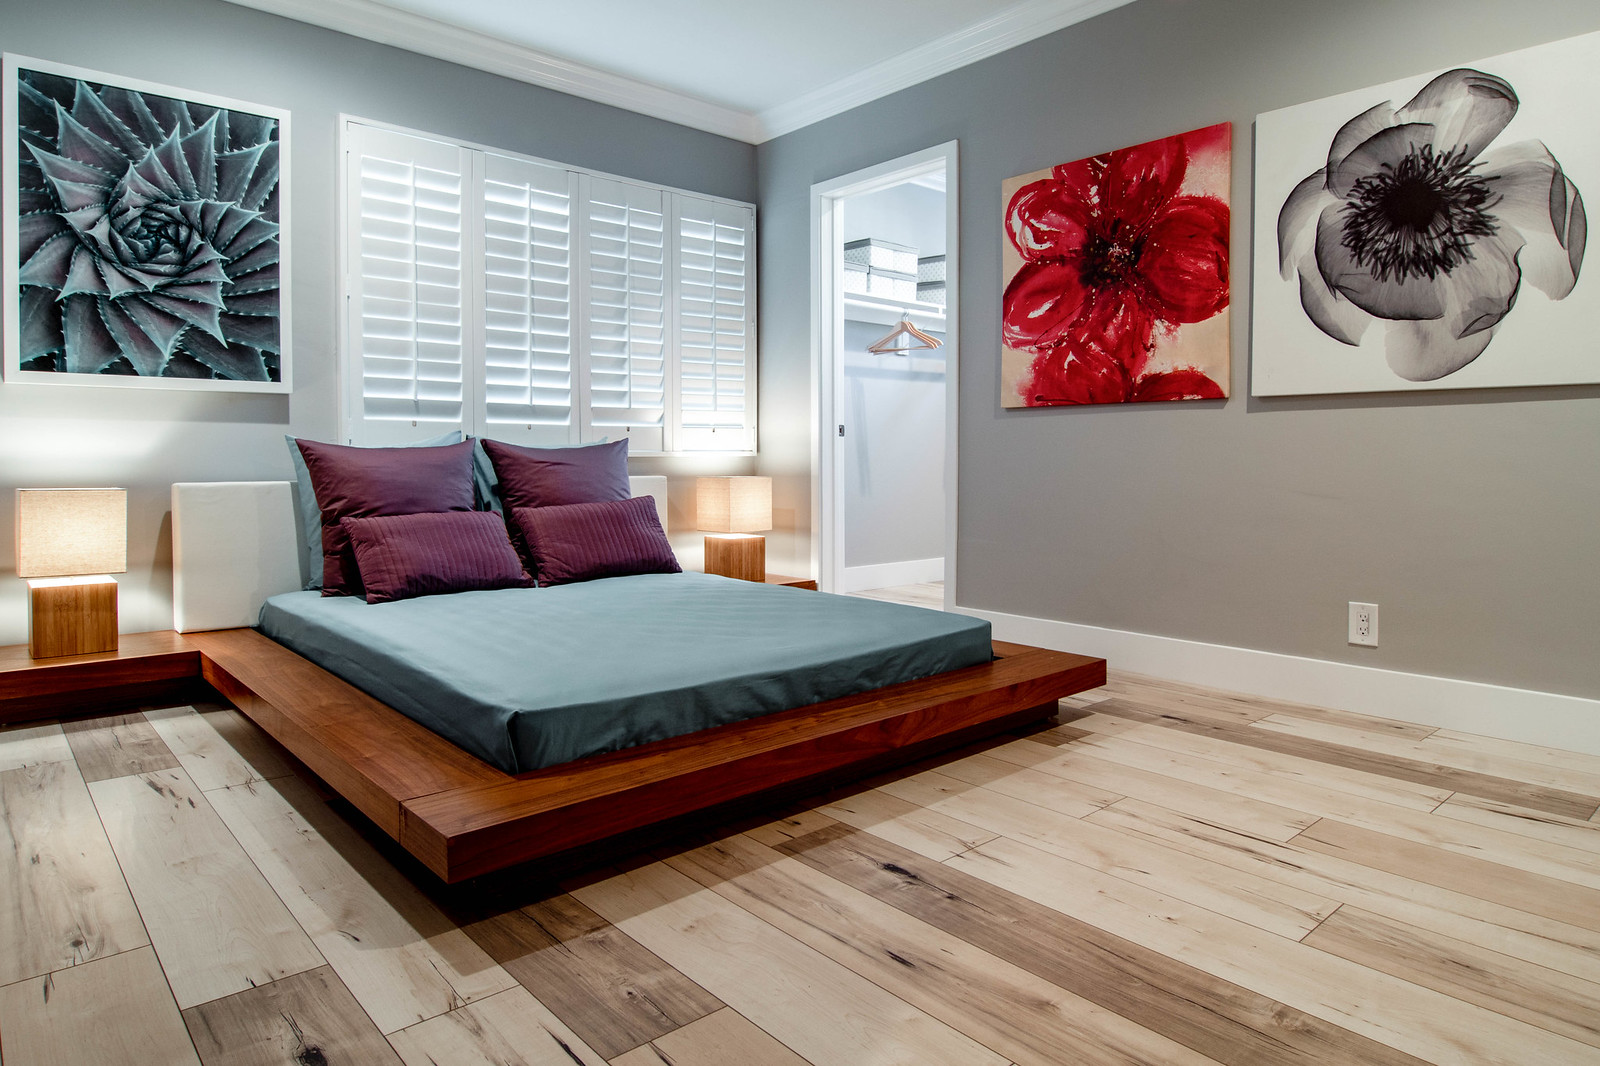 2144 Vuelta Grande-Master bedroom 1